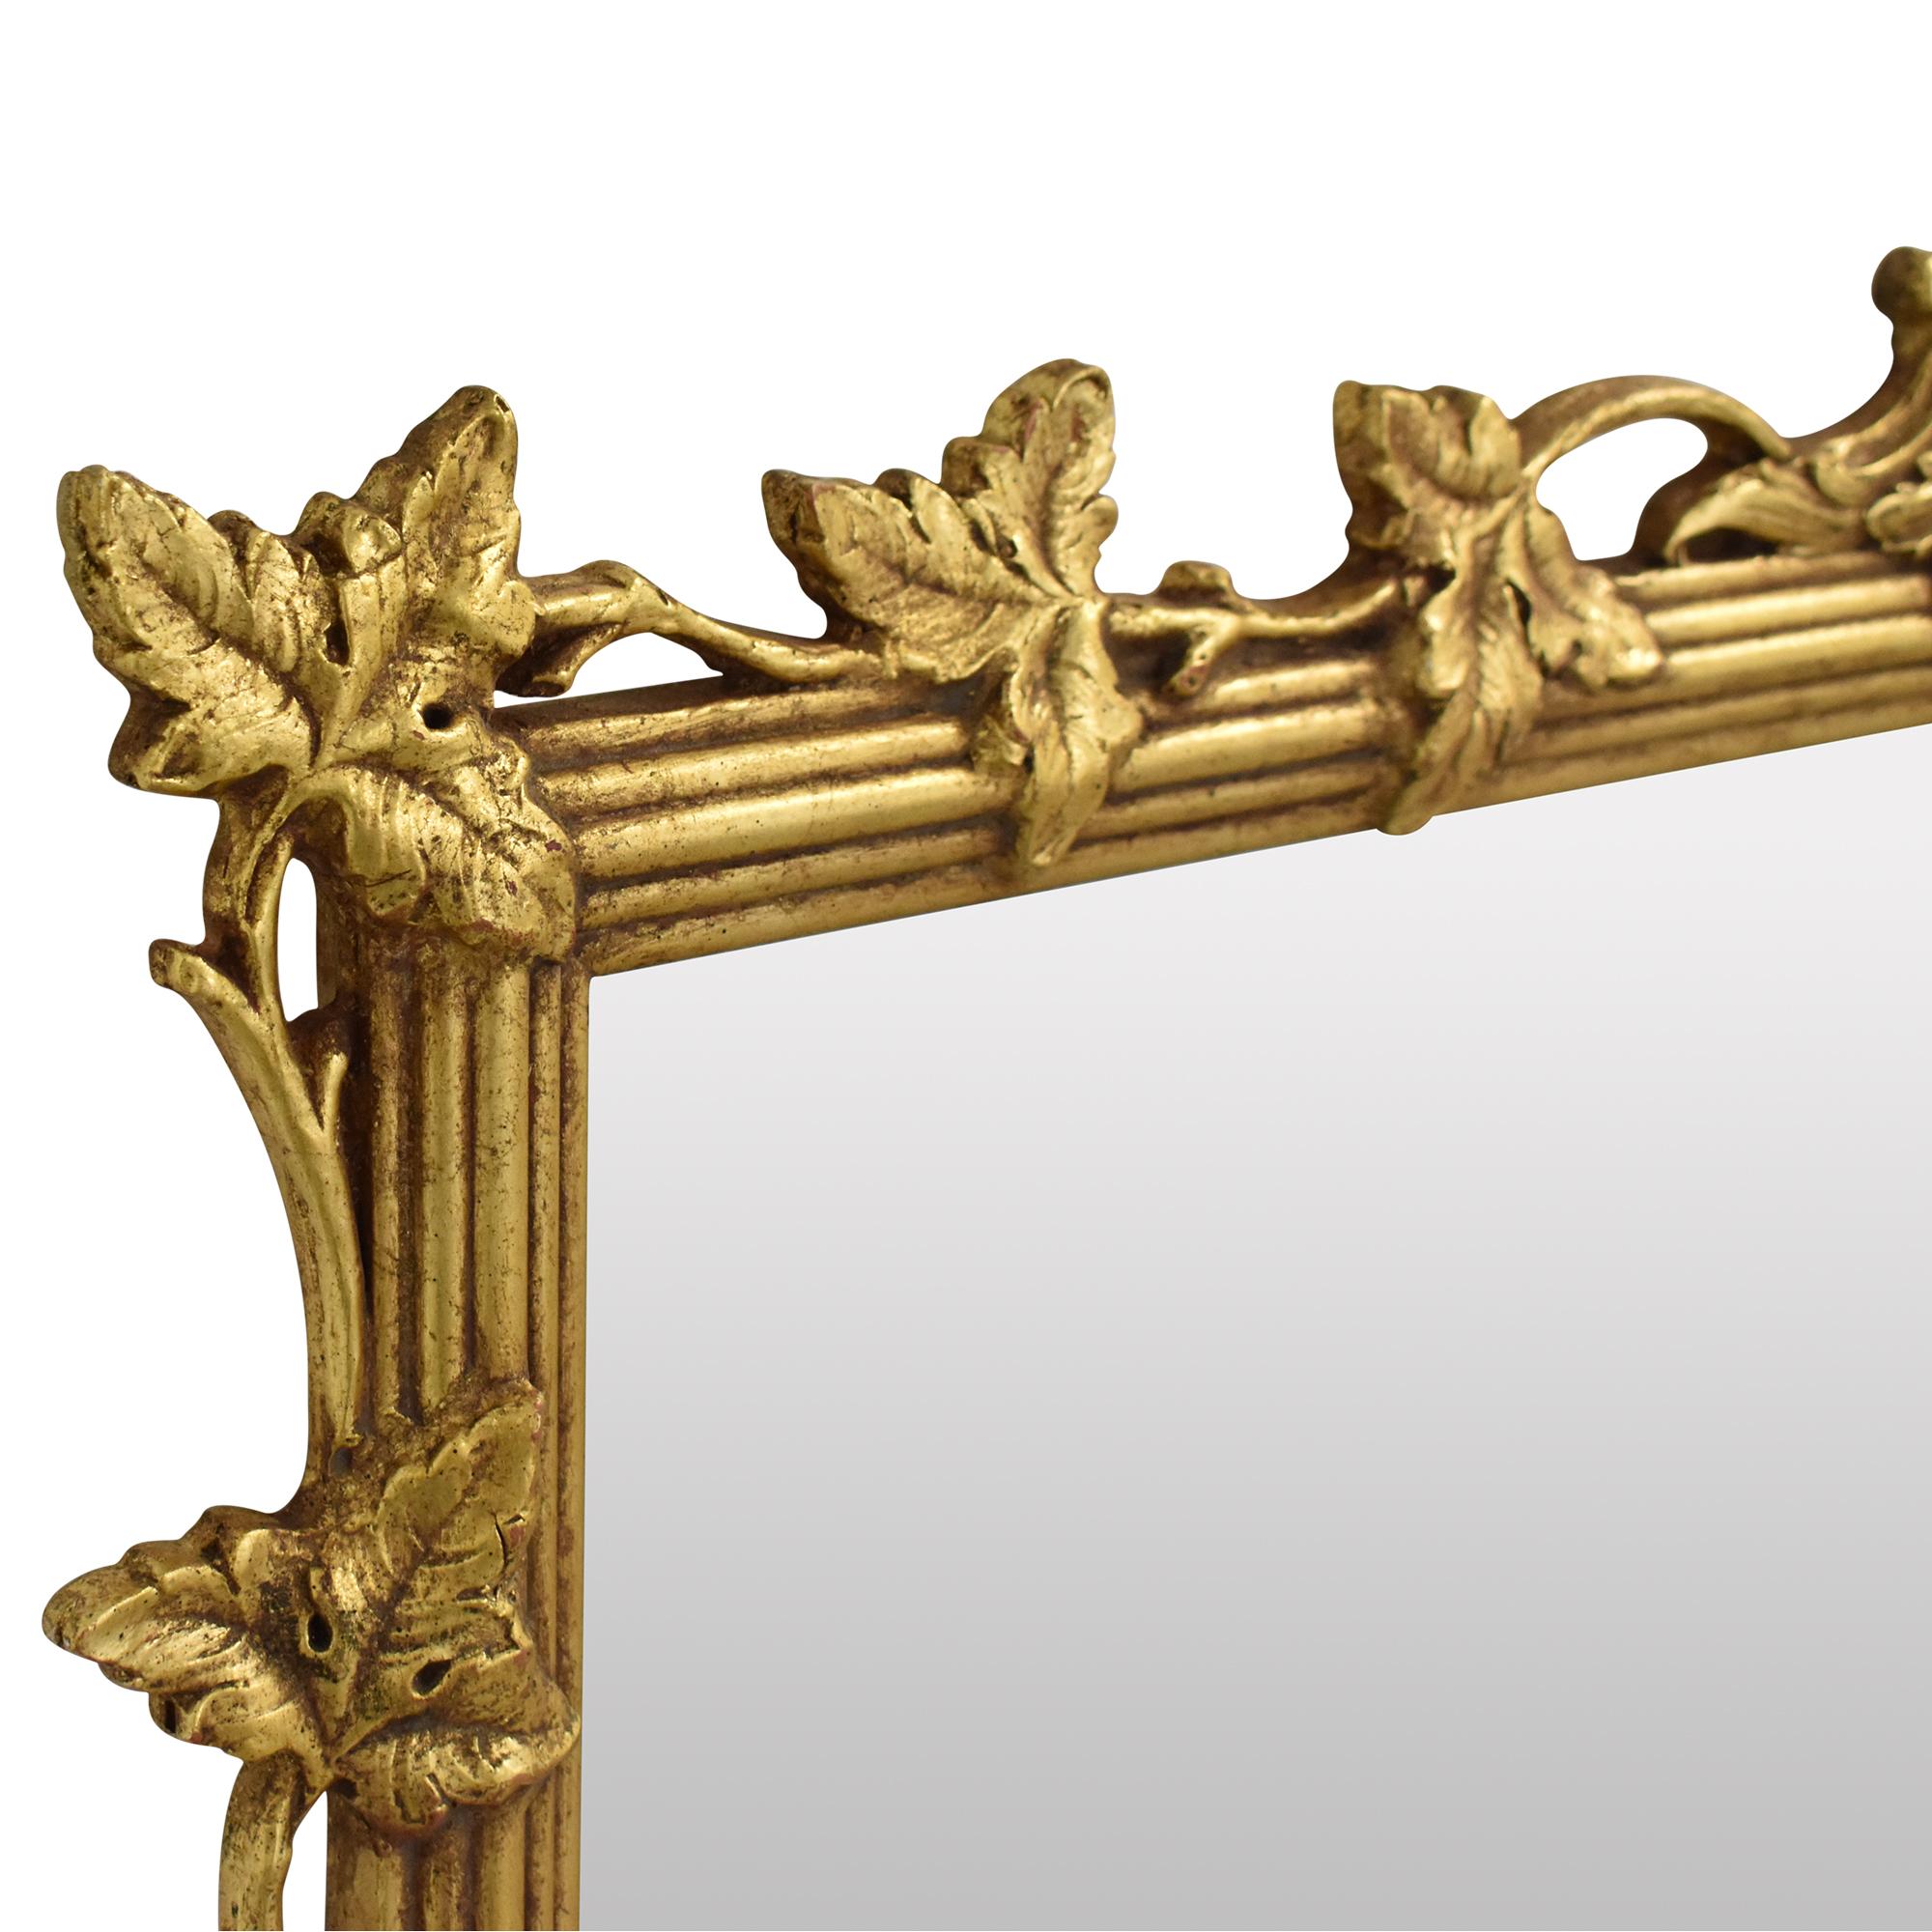 Friedman Brothers Friedman Brothers Decorative Arts Wall Mirror on sale